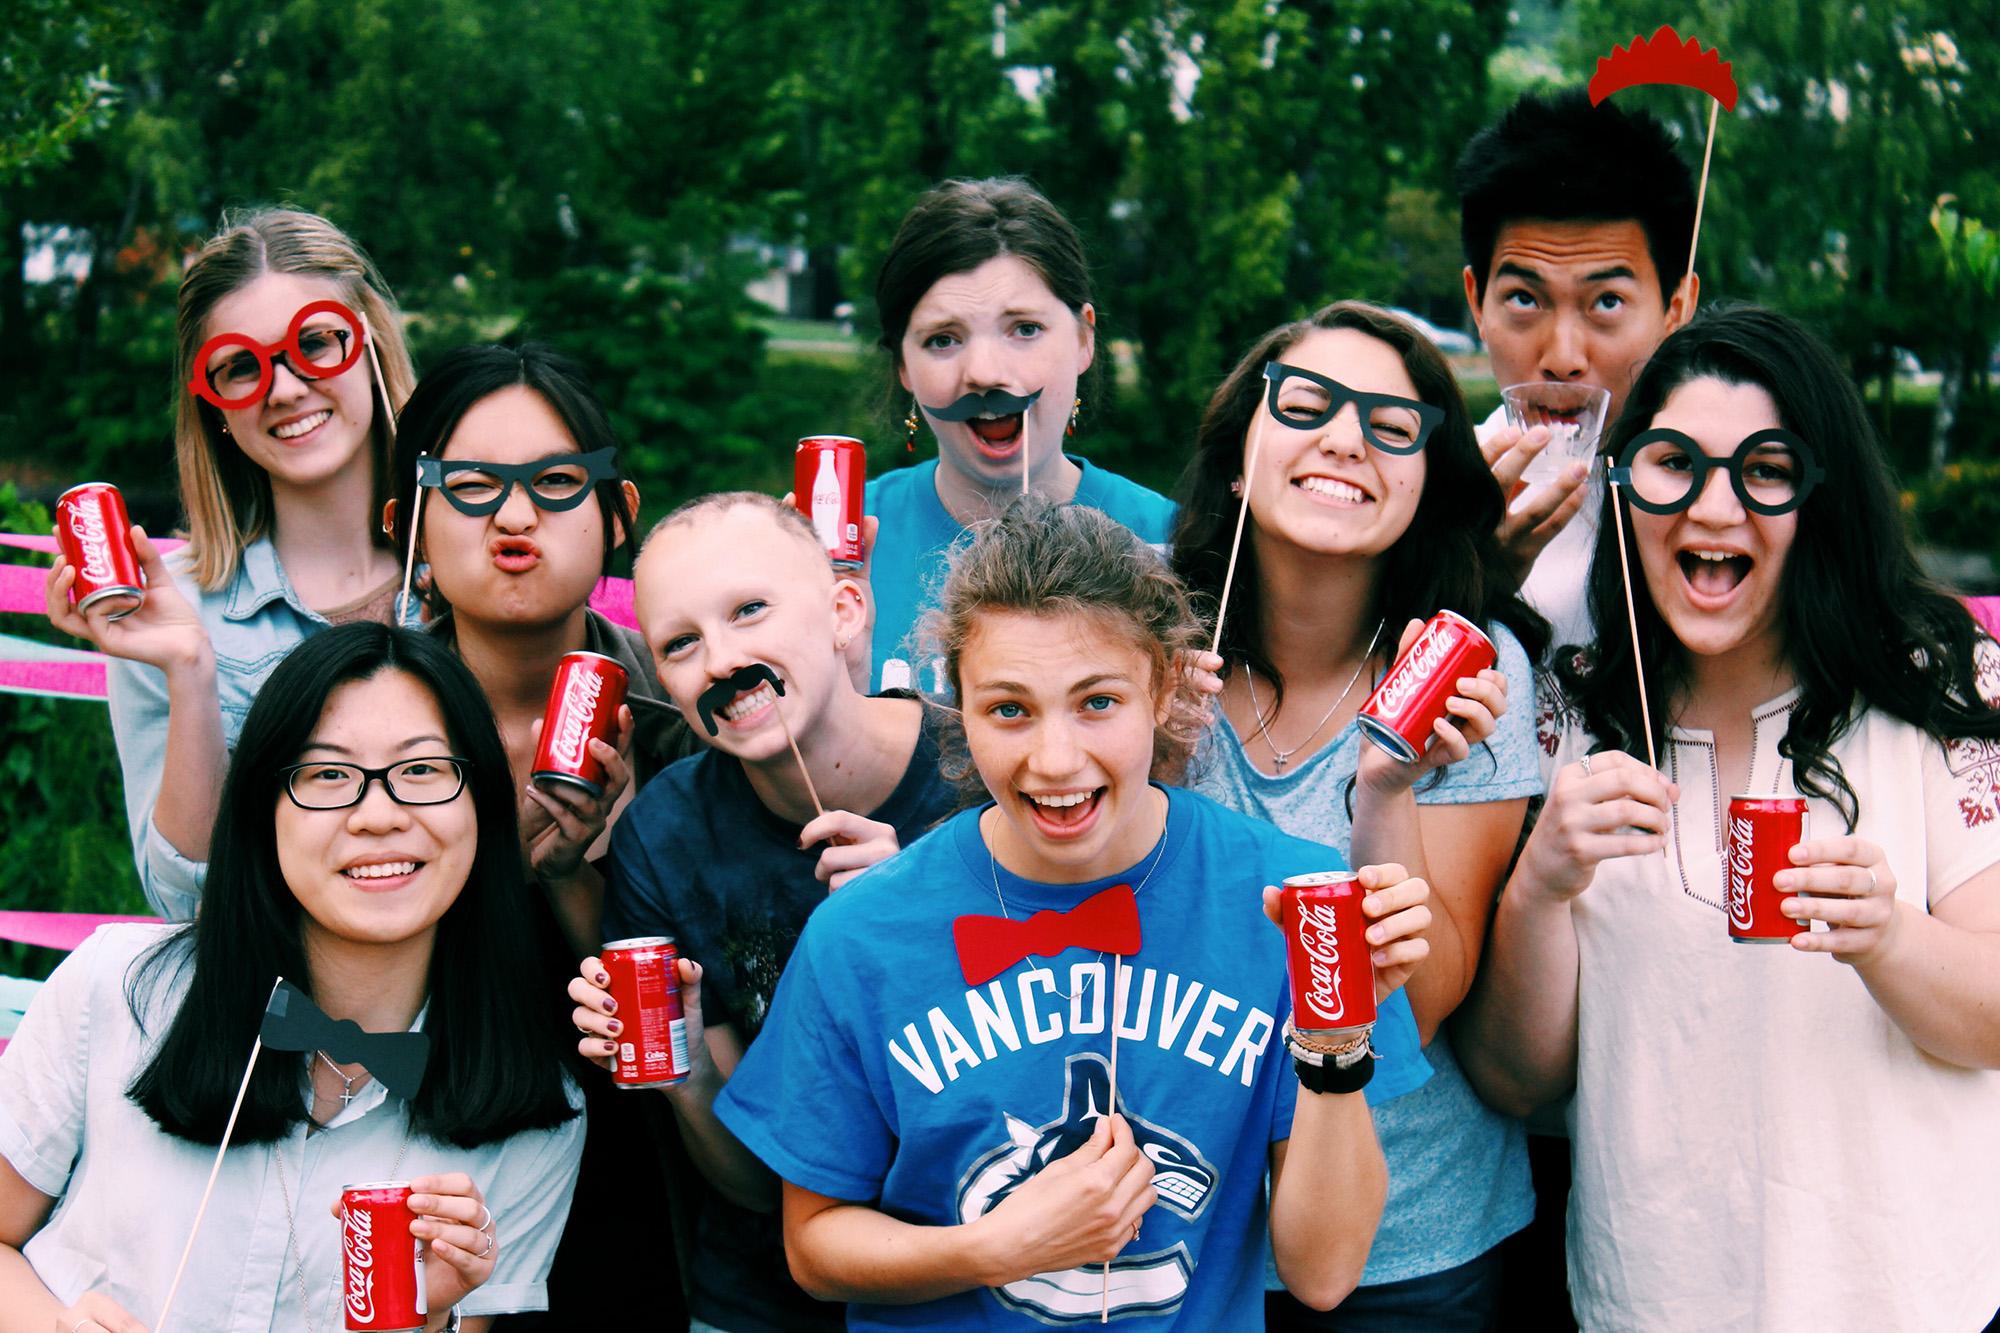 یک نمونه بازاریابی محتوایی کوکاکولا